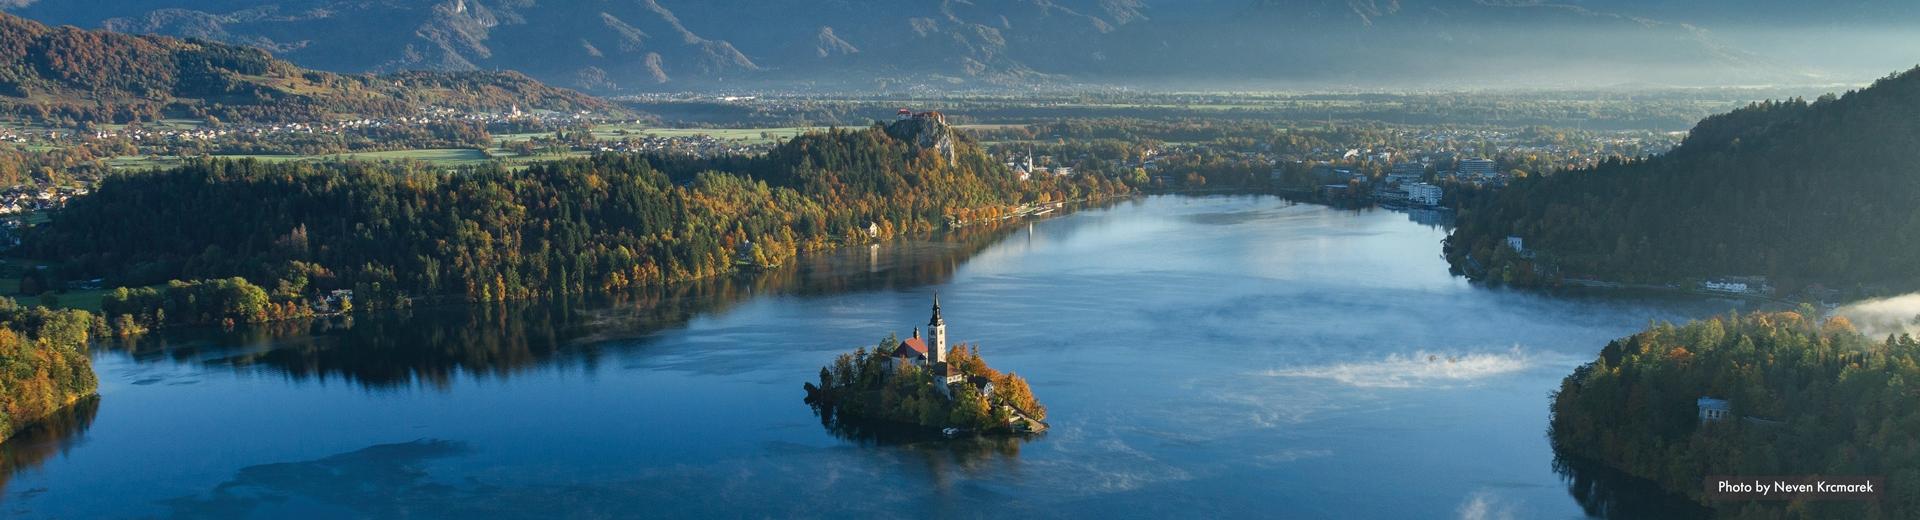 discover slovenia lake bled